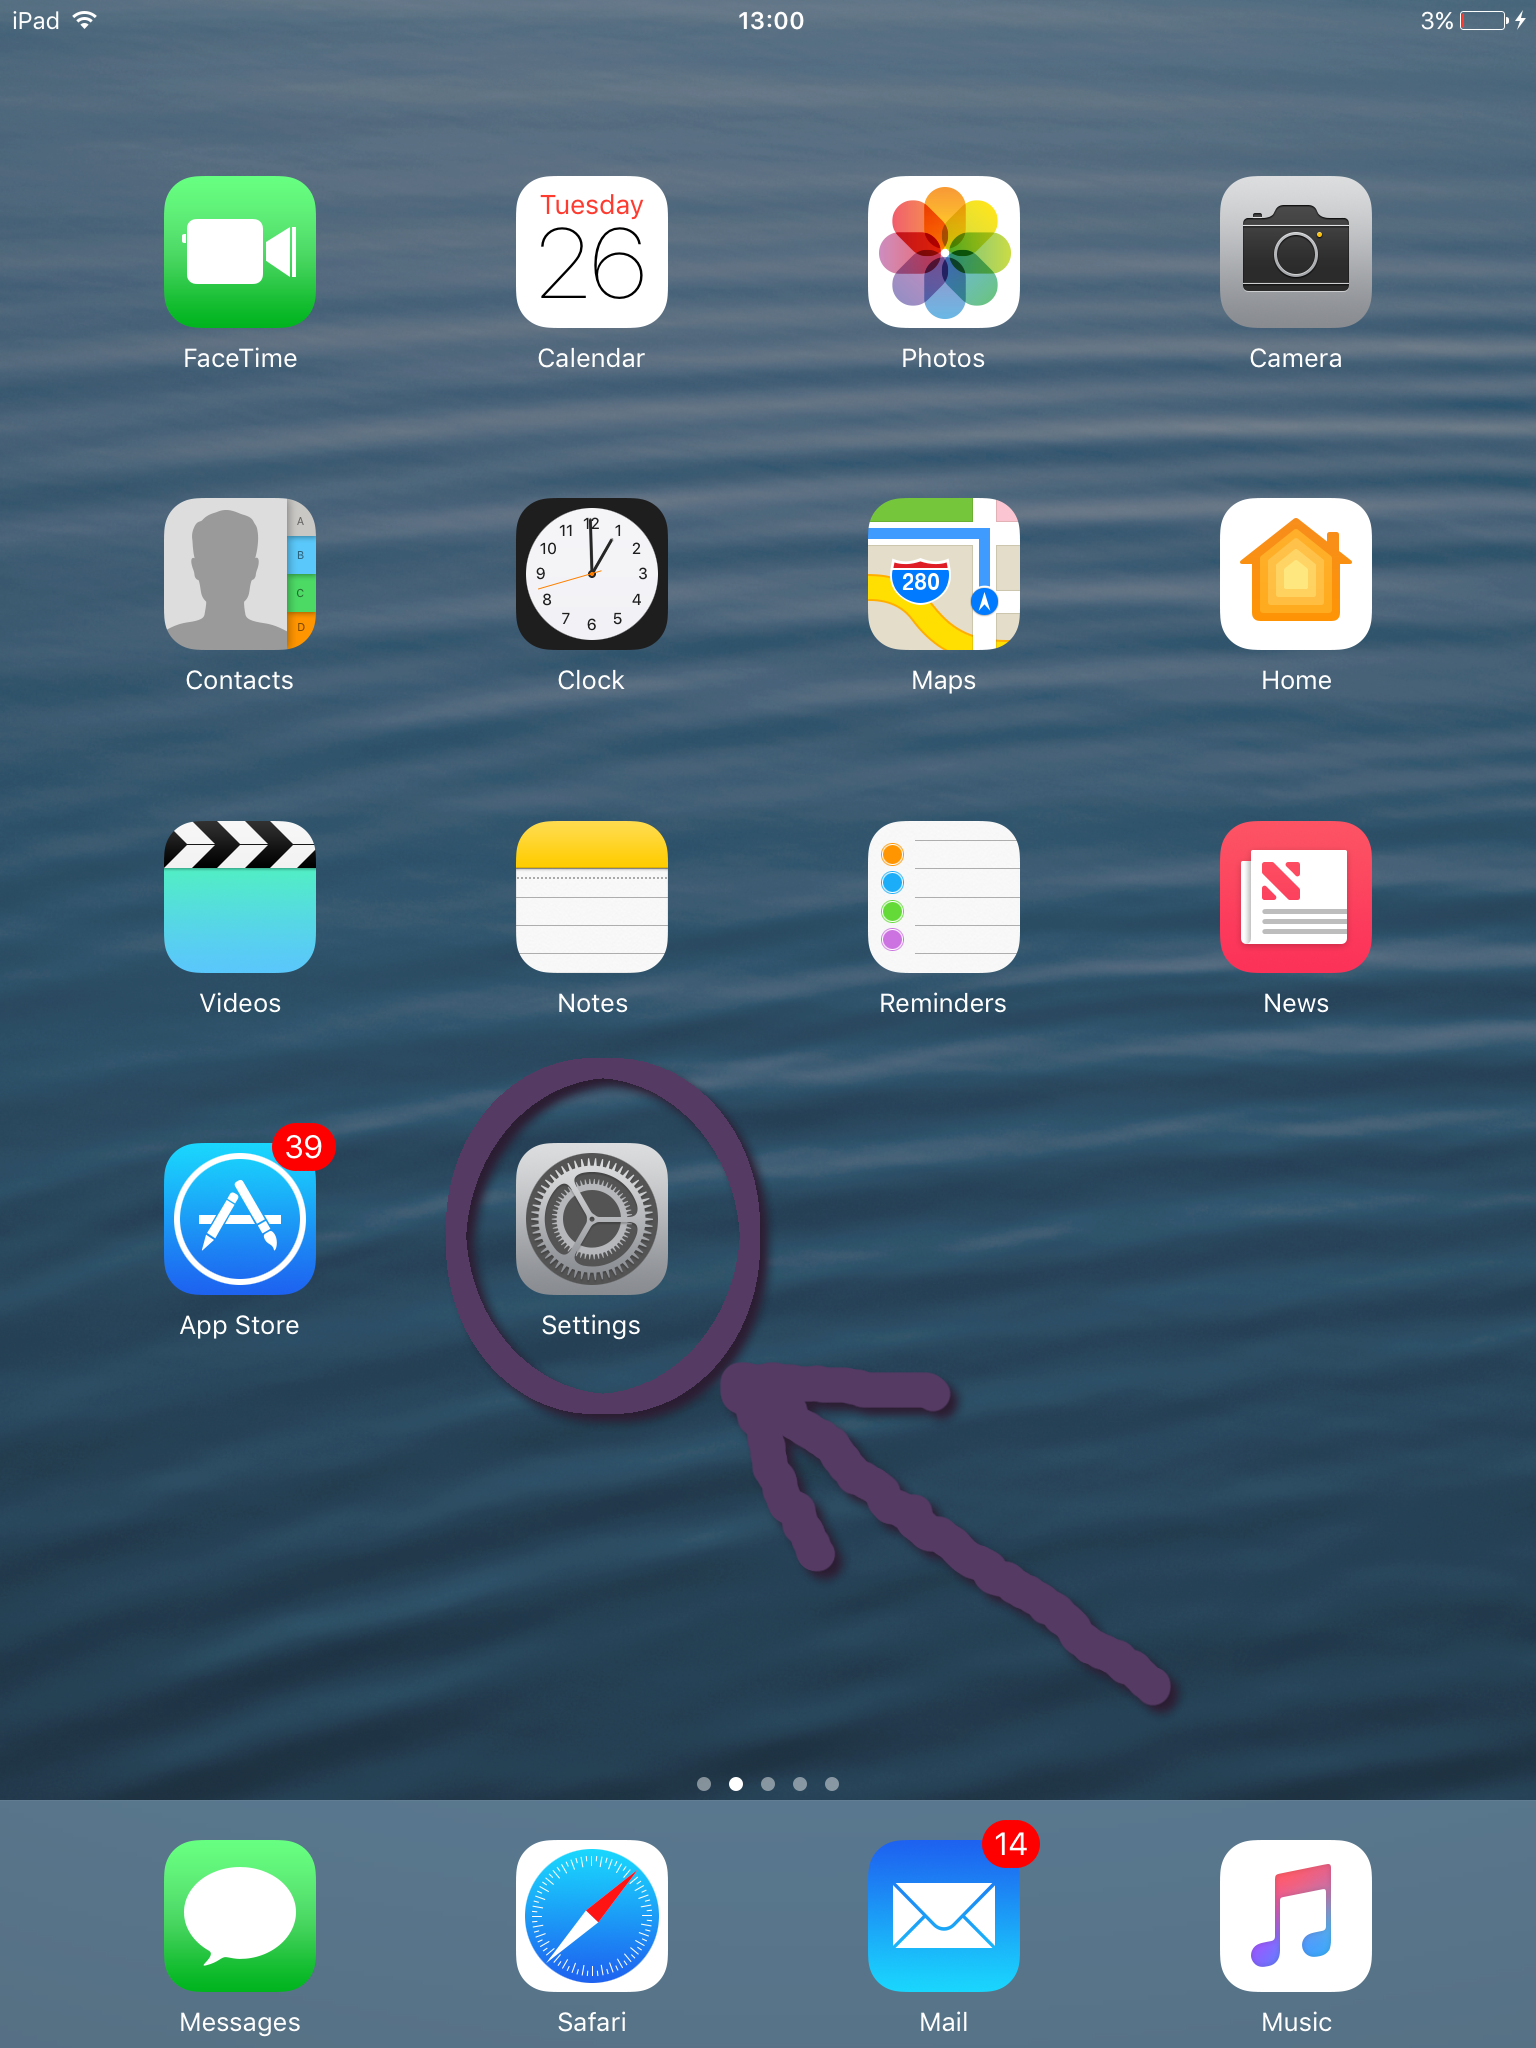 screenshot-typical-ipad-w-arrow.png